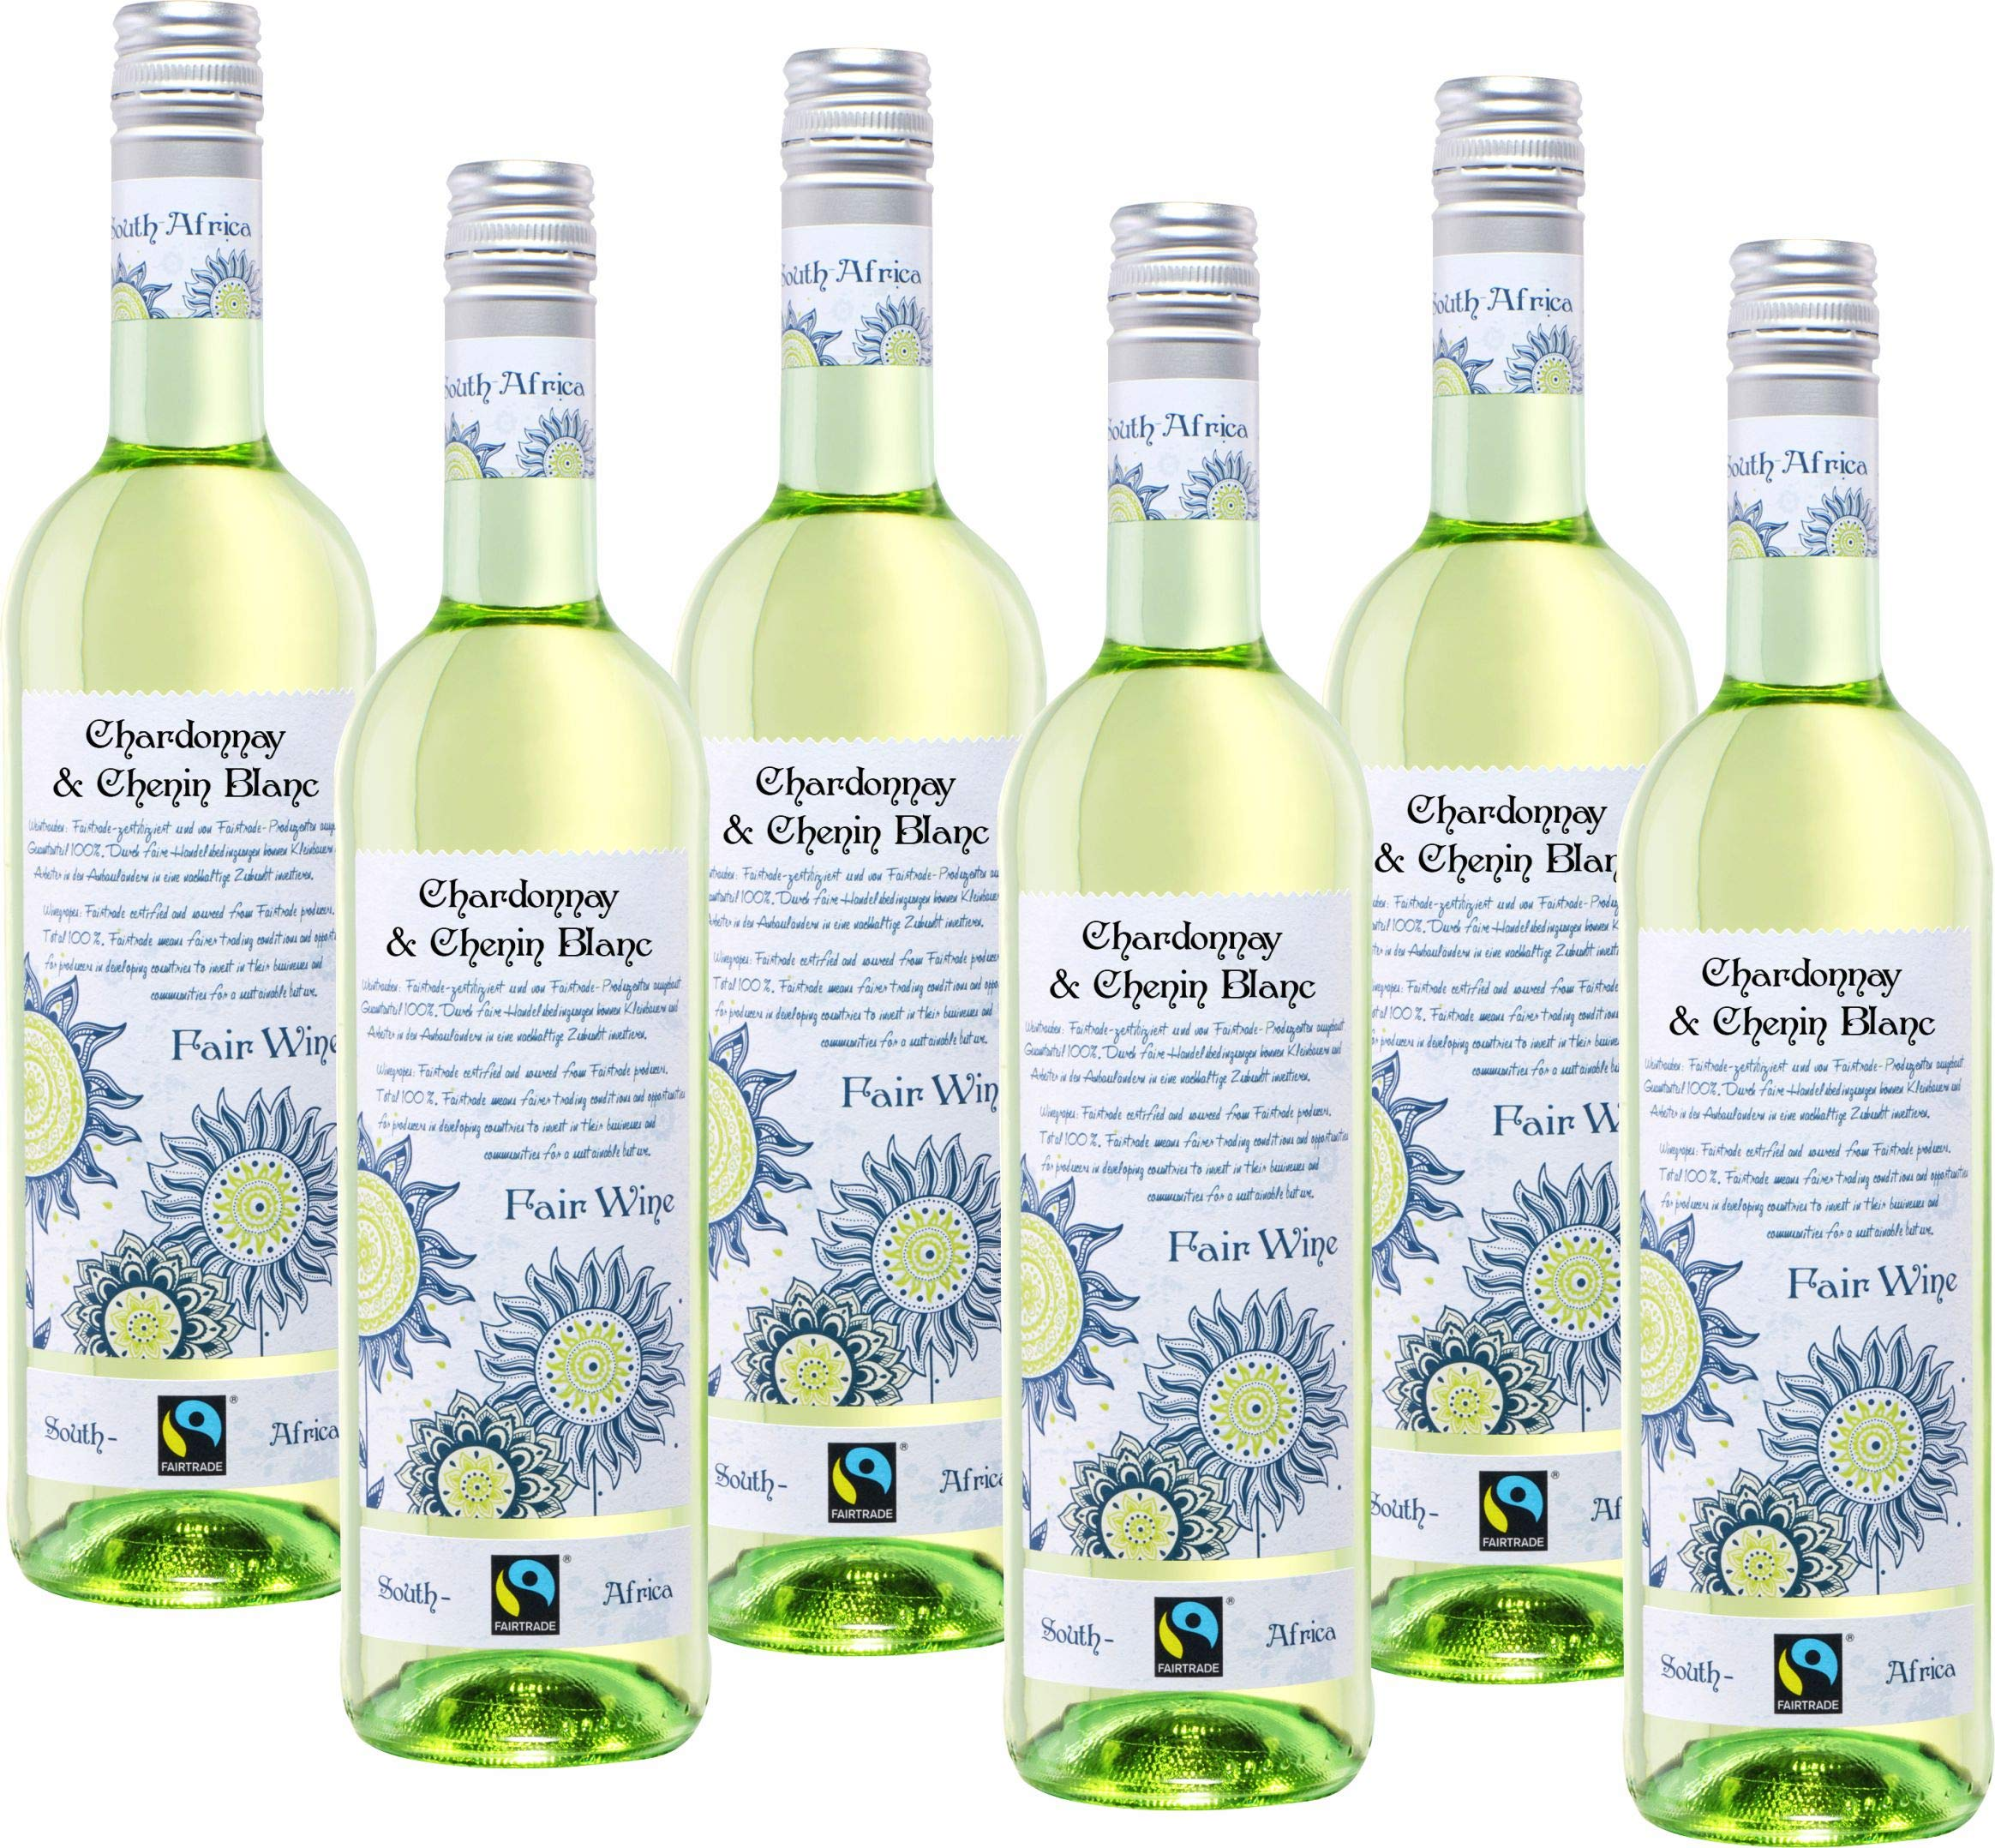 Fairtrade-Chardonnay-Chenin-Blanc-Sdafrika-Trocken-6-x-075-l